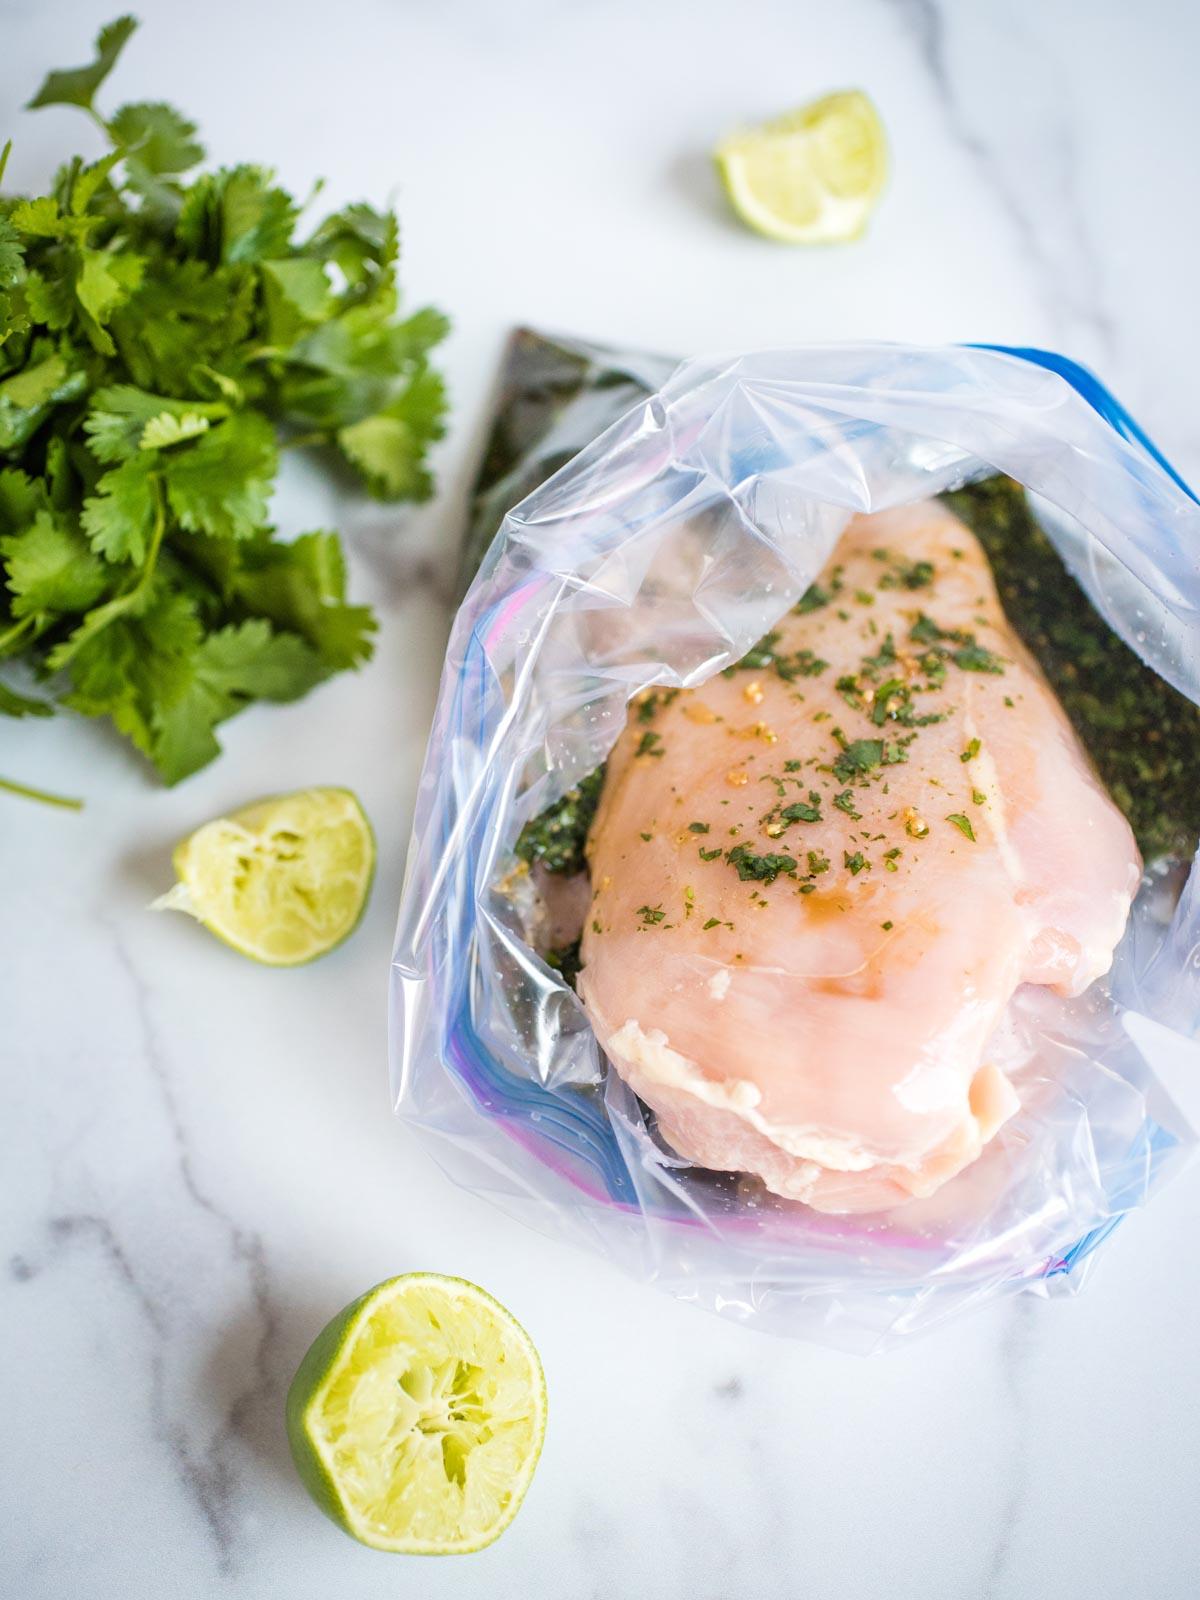 marinated chicken in a ziploc bag